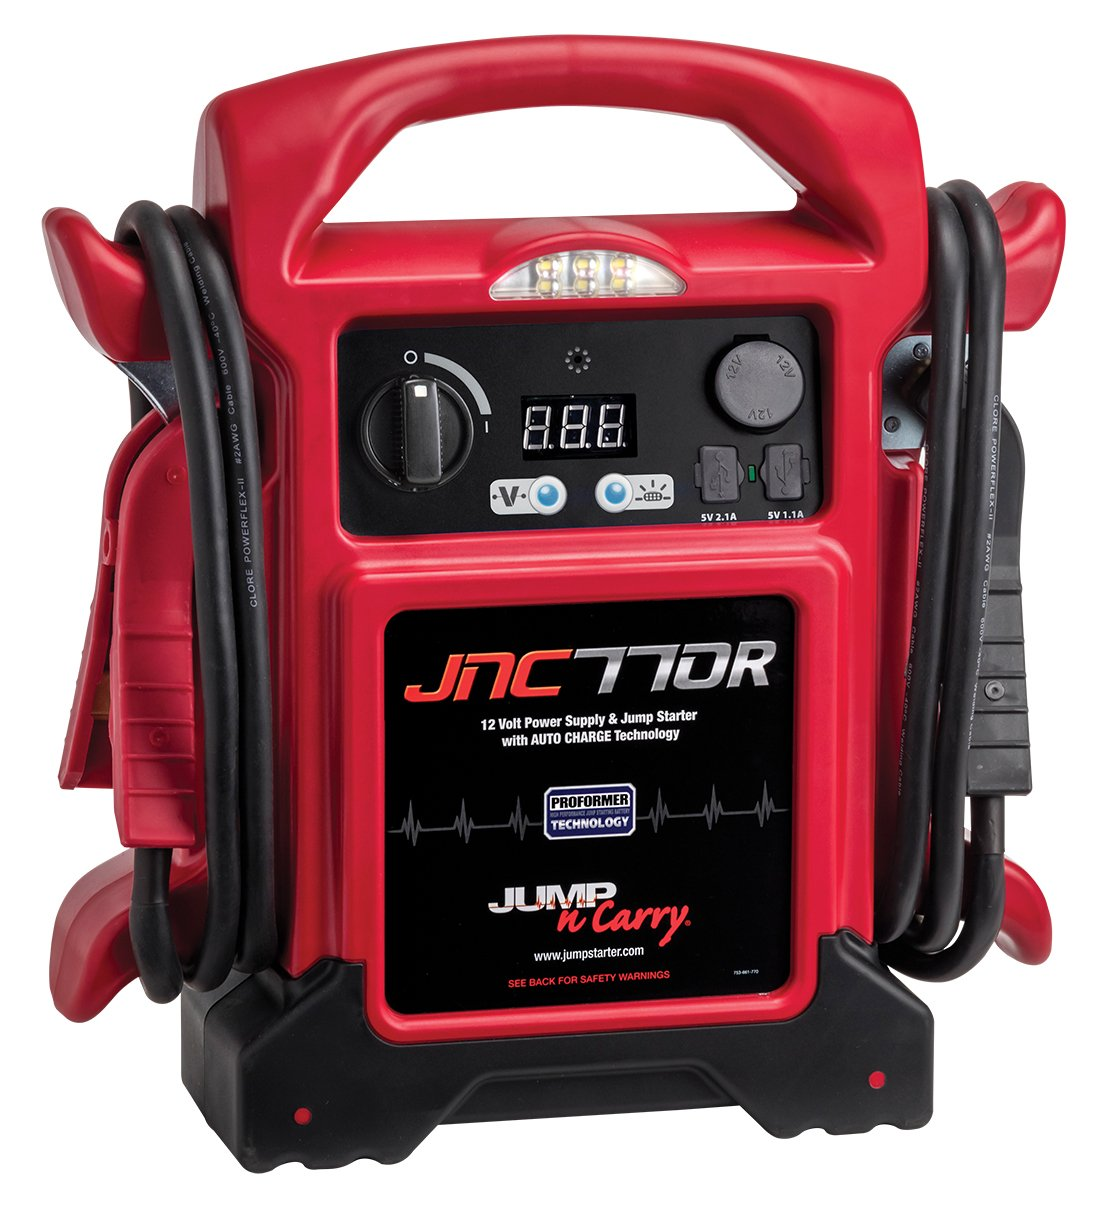 Jump-N-Carry JNC770R 1700 Peak Amp Premium 12-Volt Jump Starter - Red Clore Automotive